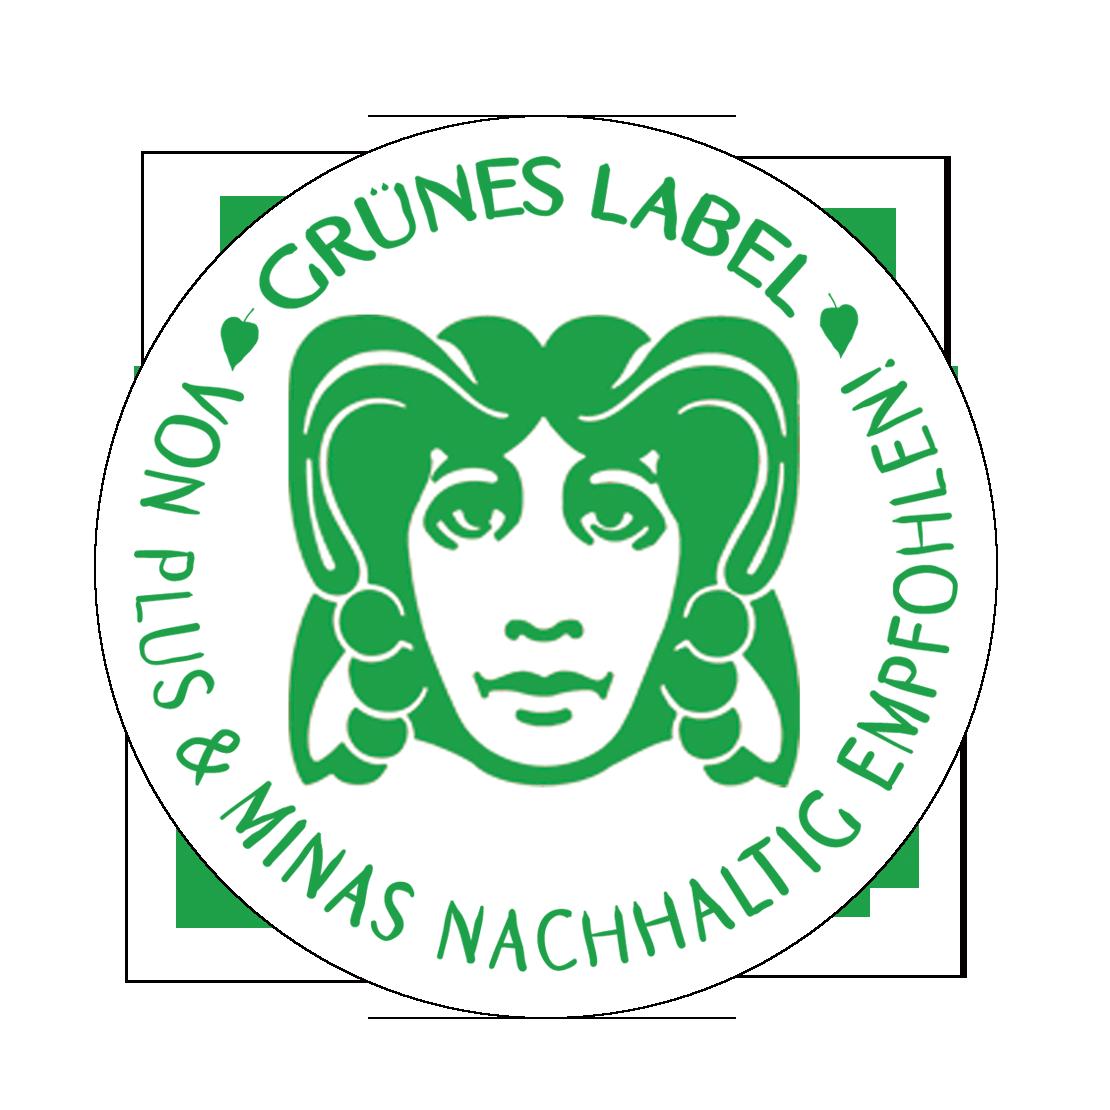 grün, grünes label, fairtrade, fair